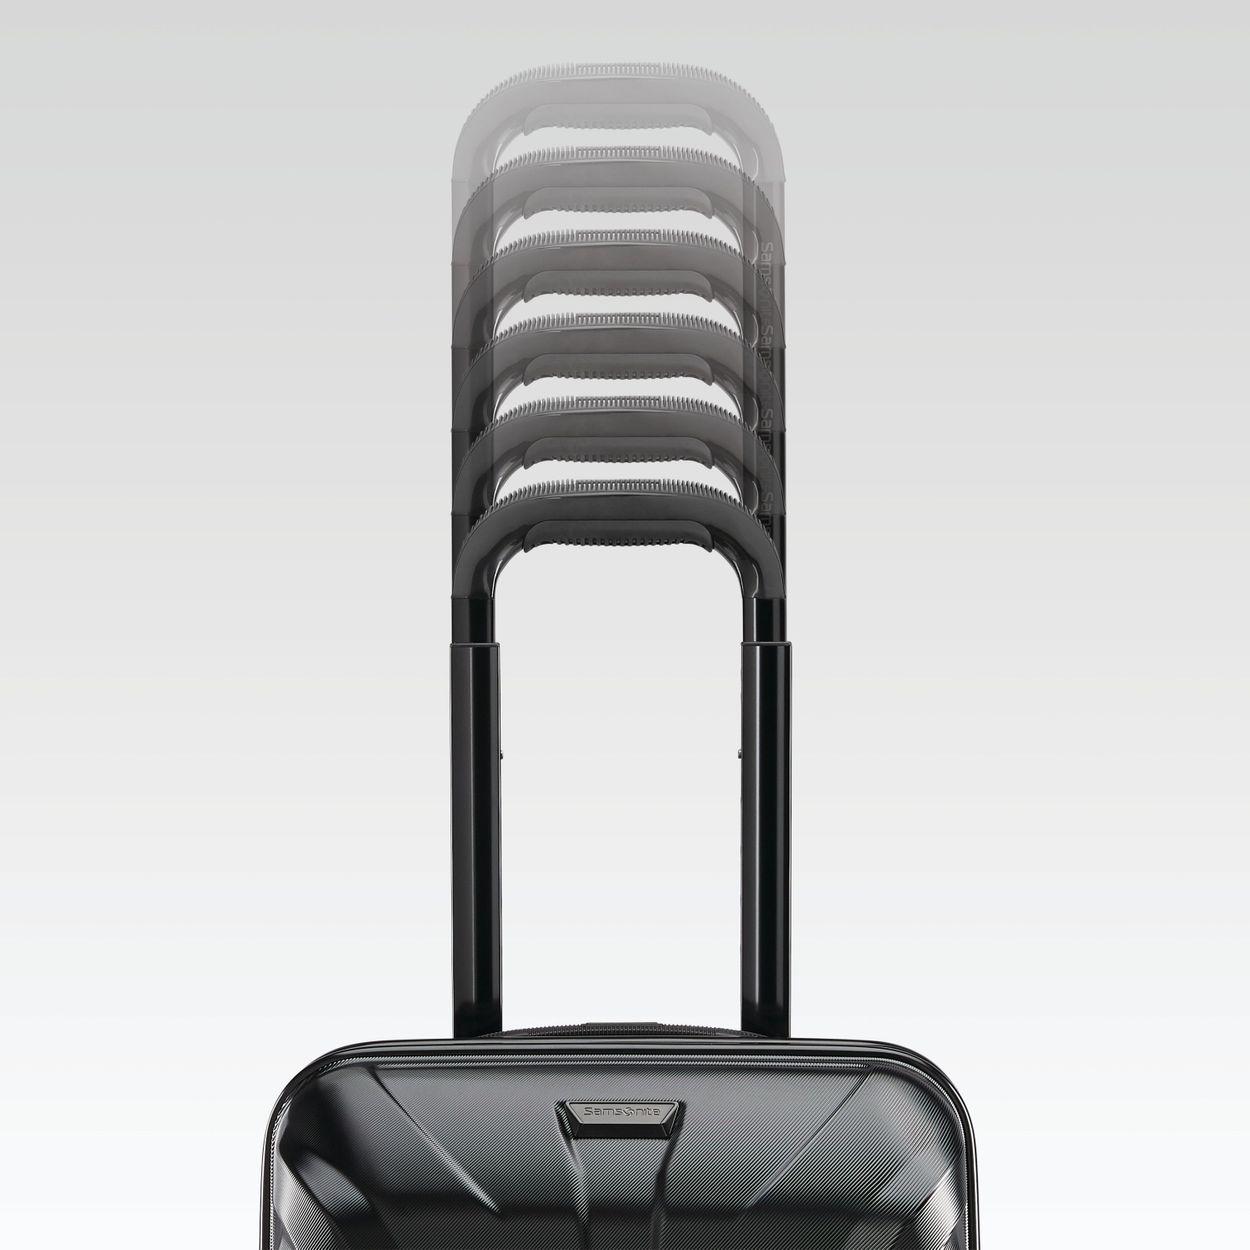 Handle, Push botton, Multi stage, locking handle,